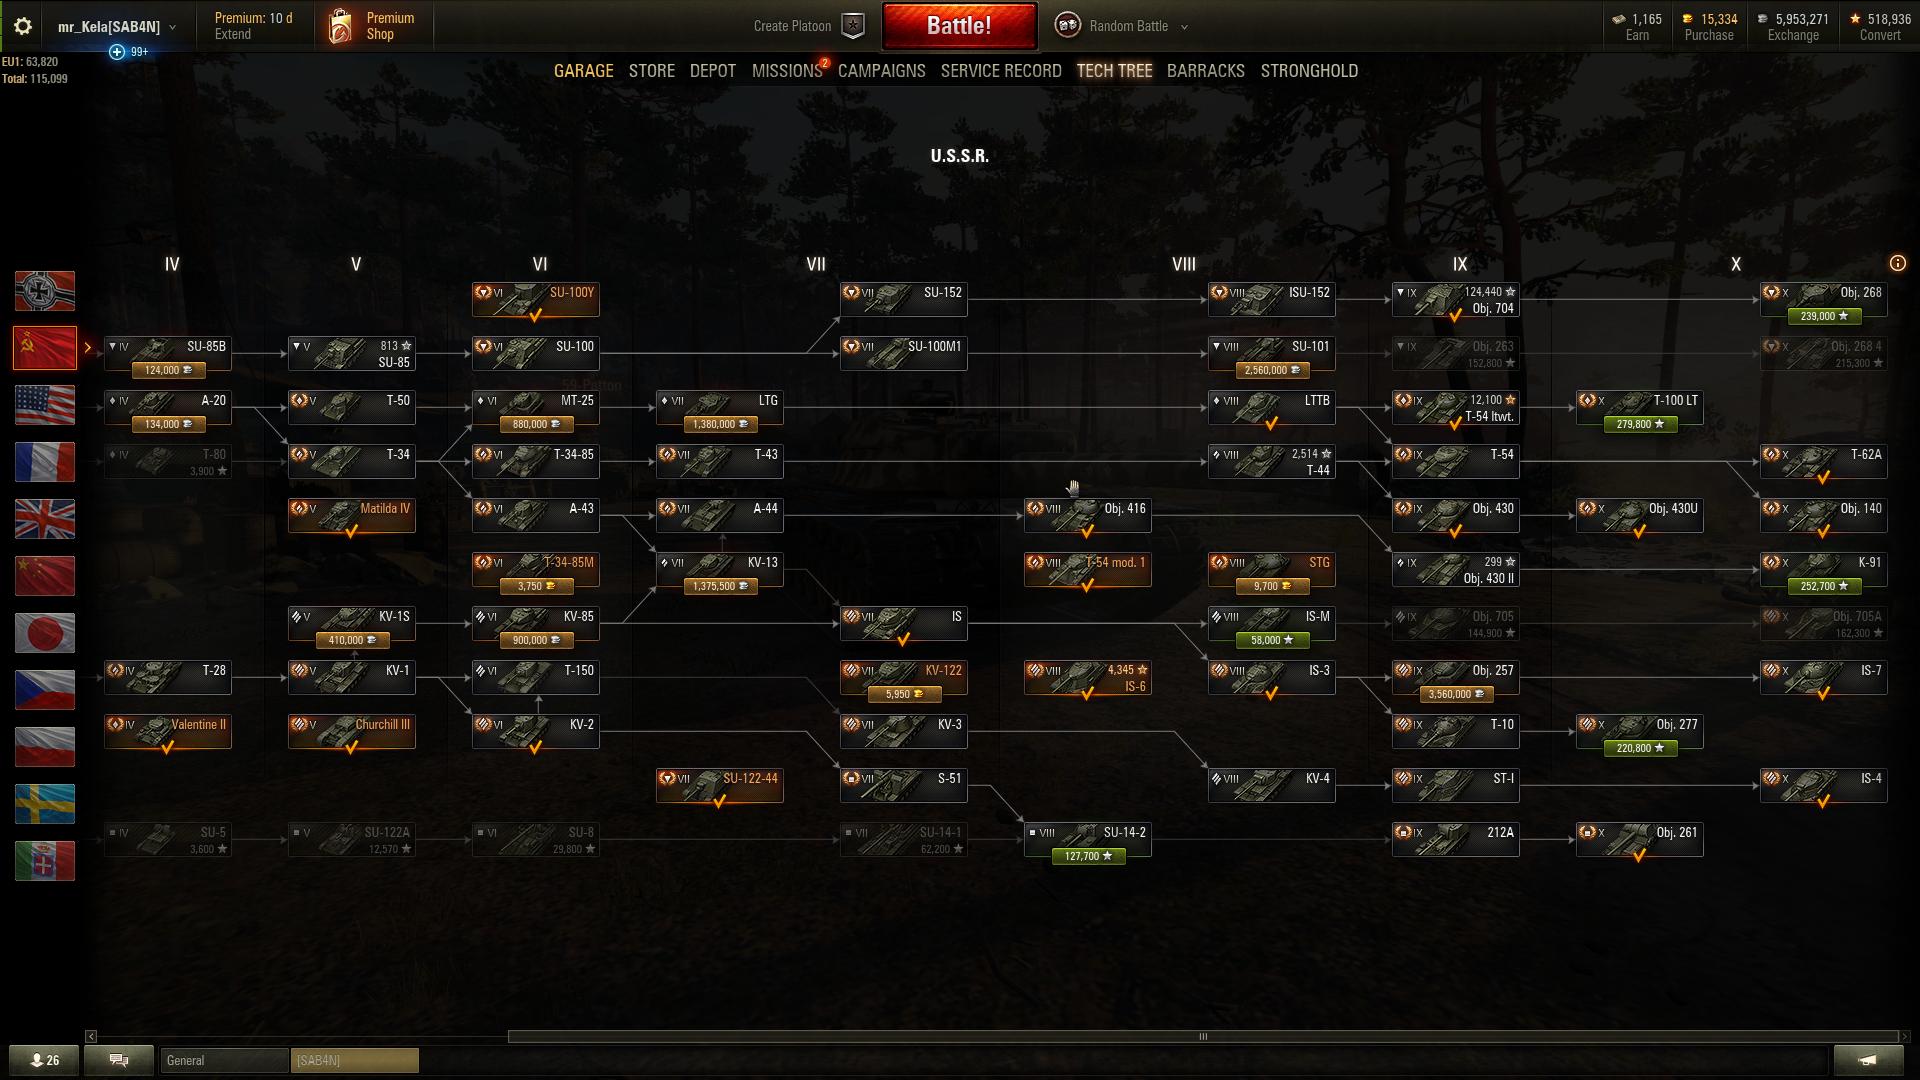 World of Tanks Ruskin novi teski tenk Obj 705a